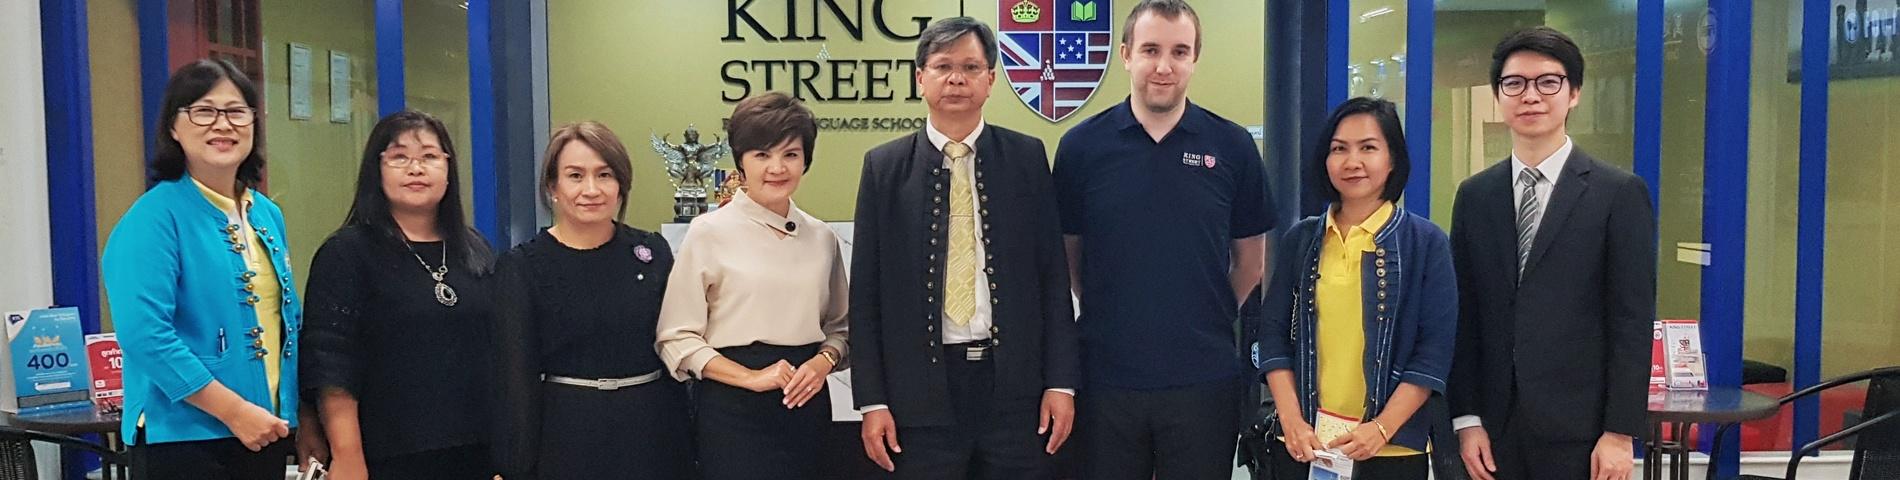 King Street English Language School afbeelding 1